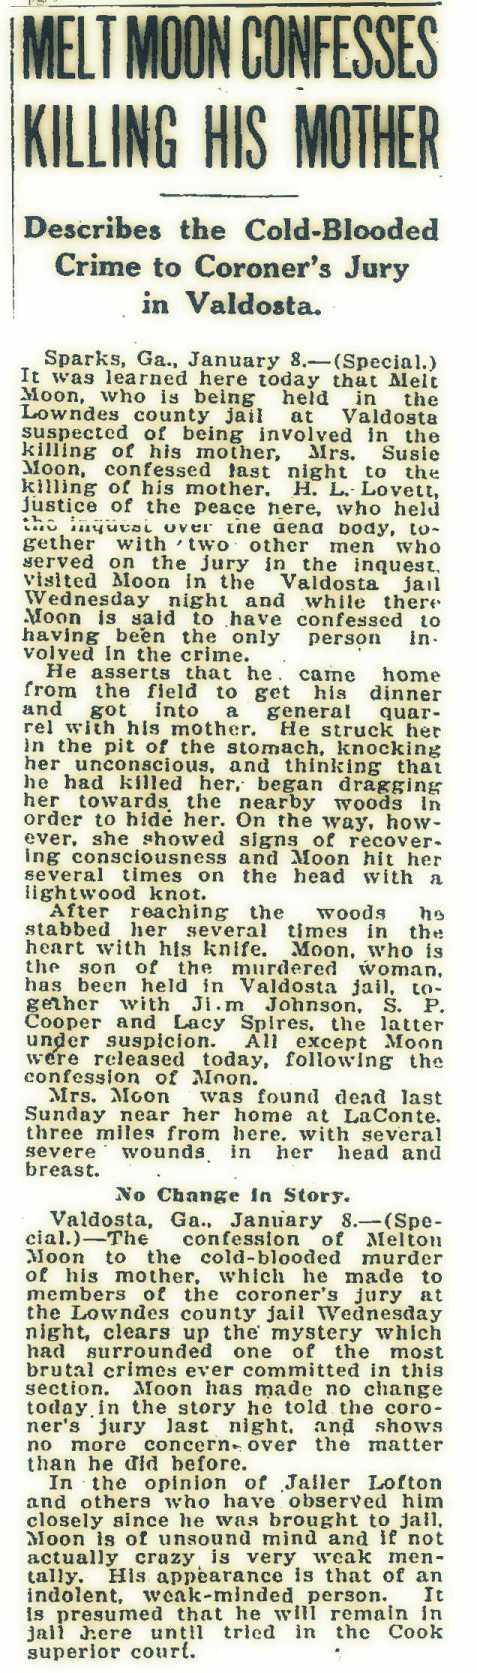 Melton Moon Confesses, Jan 9, 1920, Atlanta Constitution